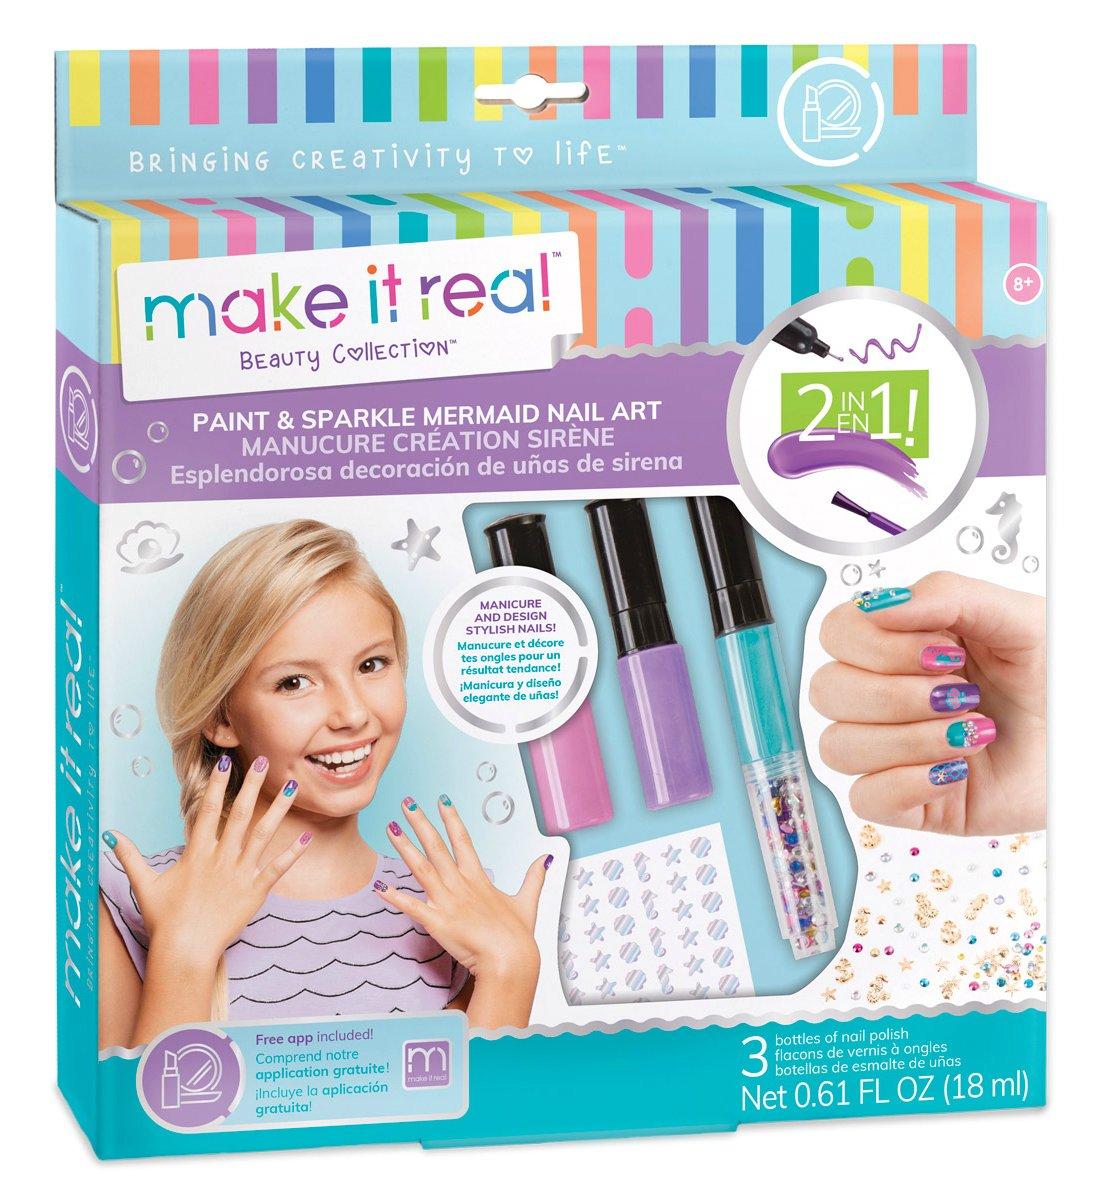 Make It Real Paint & Sparkle Mermaid Nail Art. Mermaid Nail Polish, Sticker, and Decoration Kit for Girls. Includes Mermaid Nail Polish, Mermaid Stickers and Mermaid Nail Art Decorations